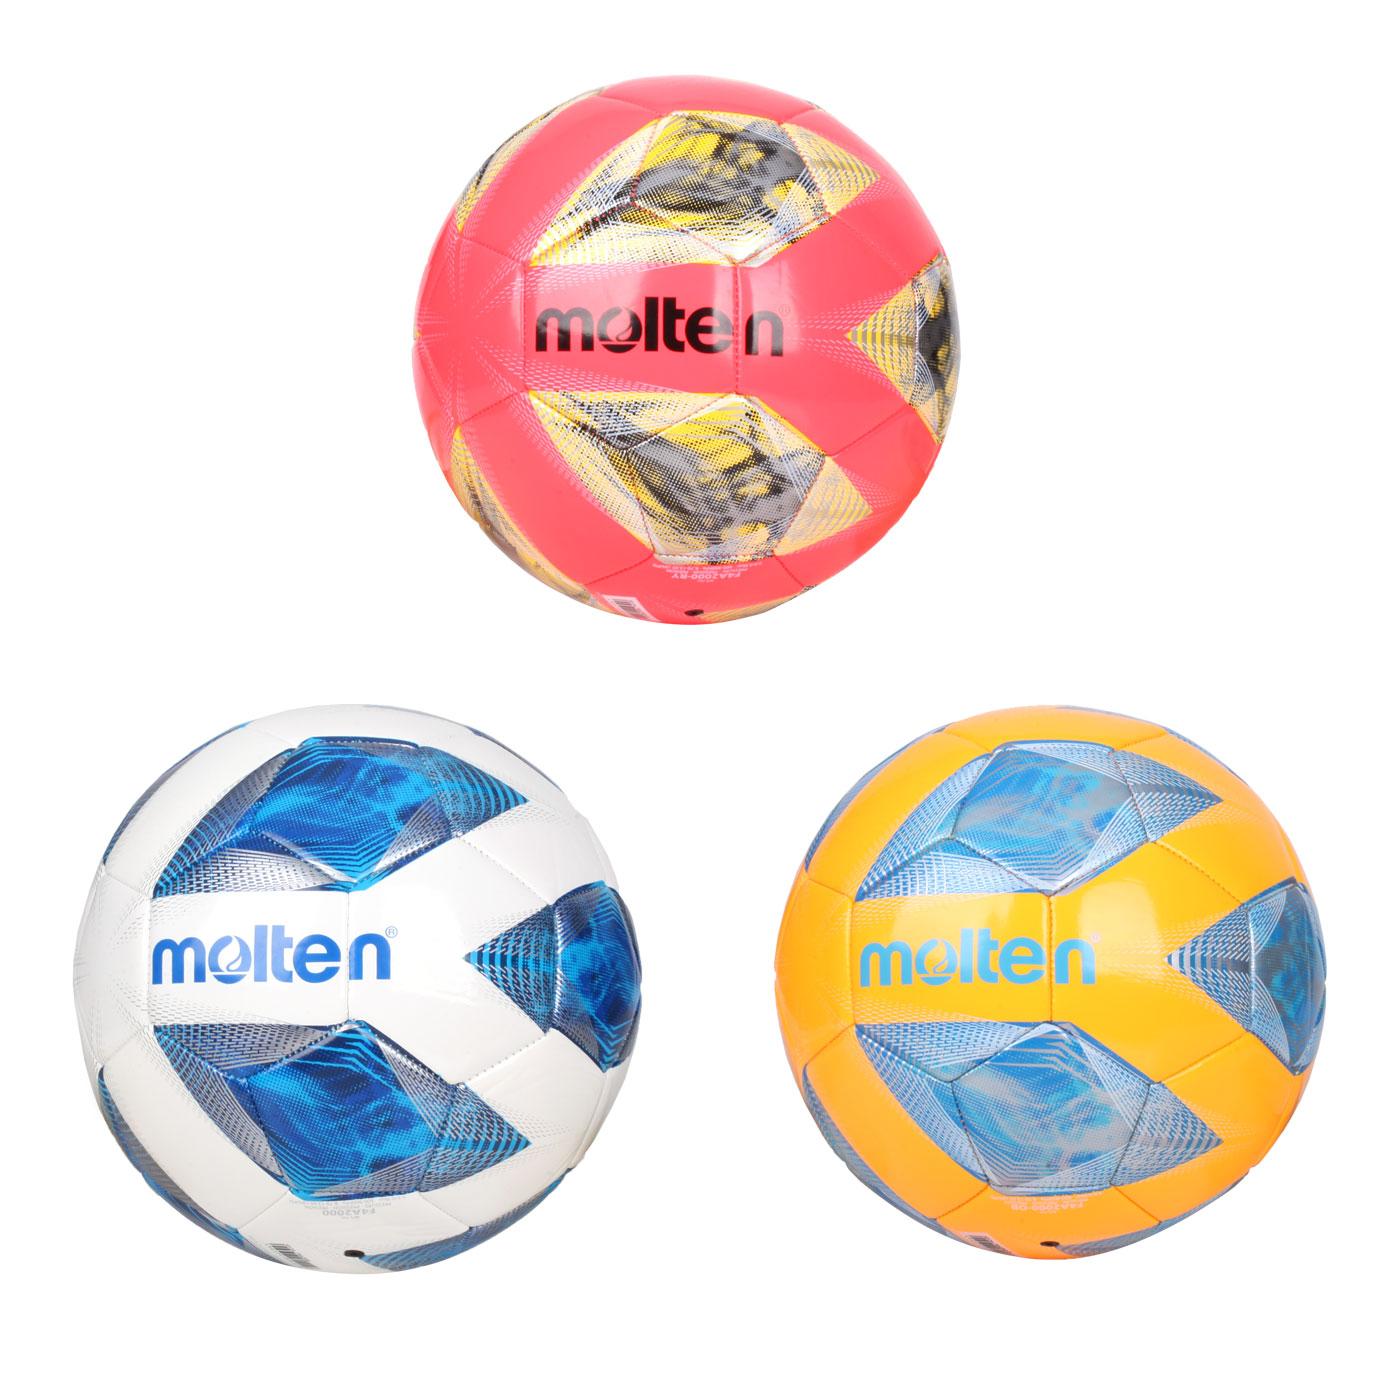 Molten #4合成皮足球 F4A2000